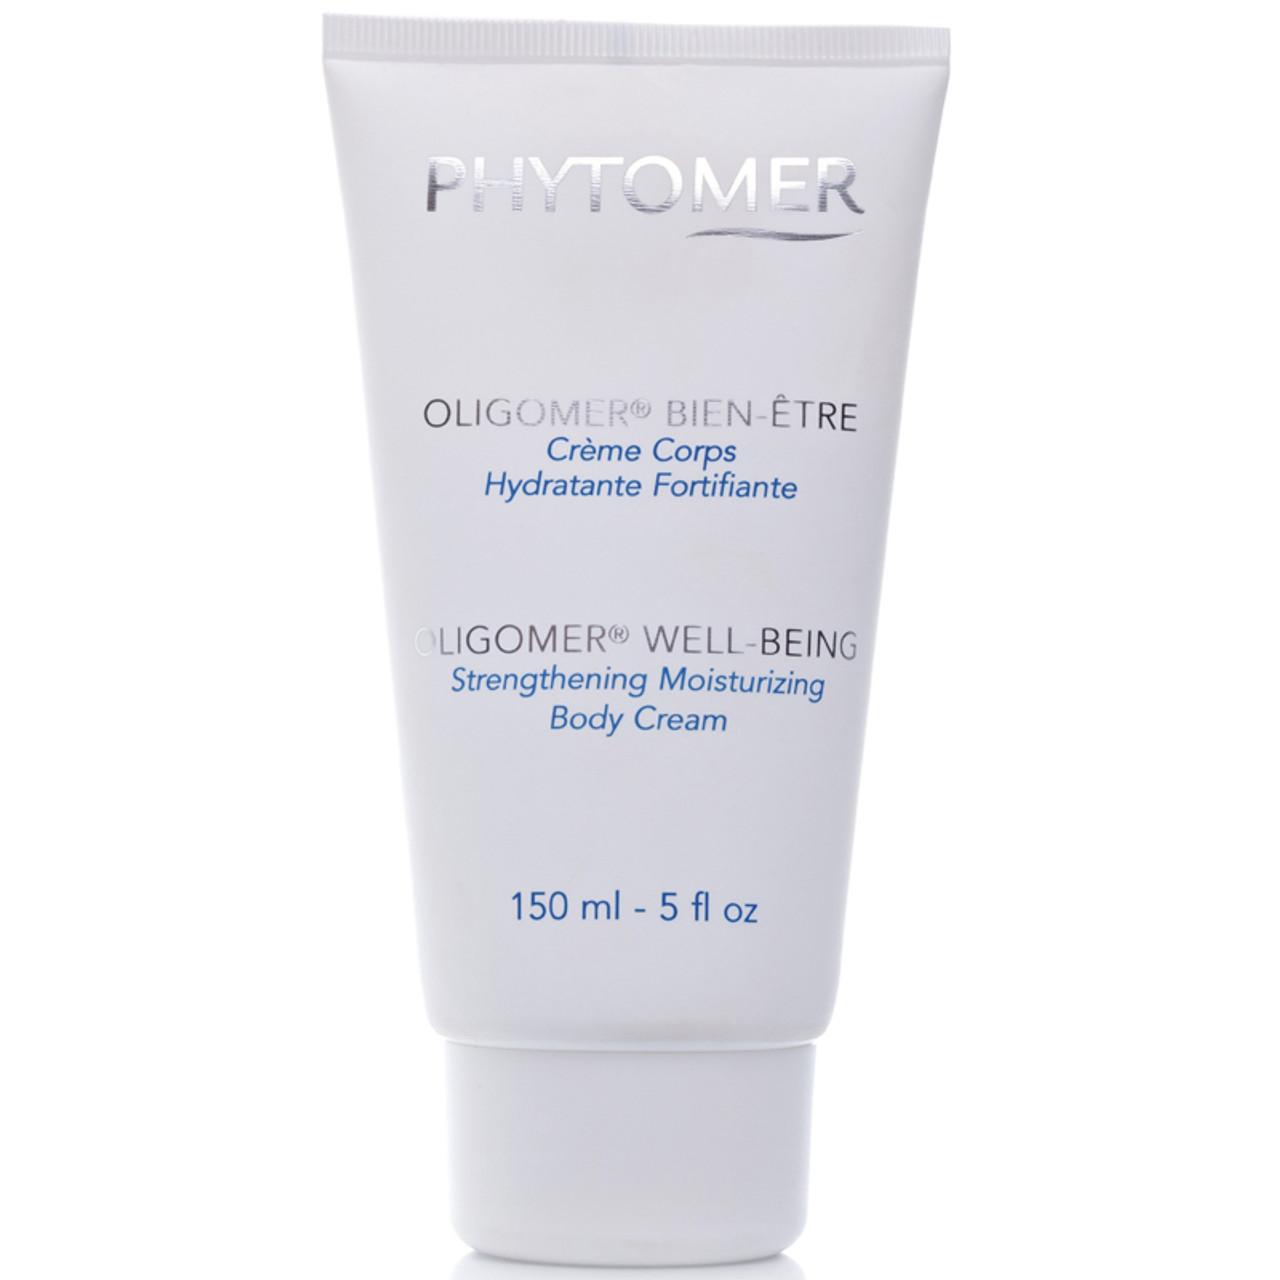 Phytomer Oligomer Well-Being Strengthening Moisturizing Body Cream